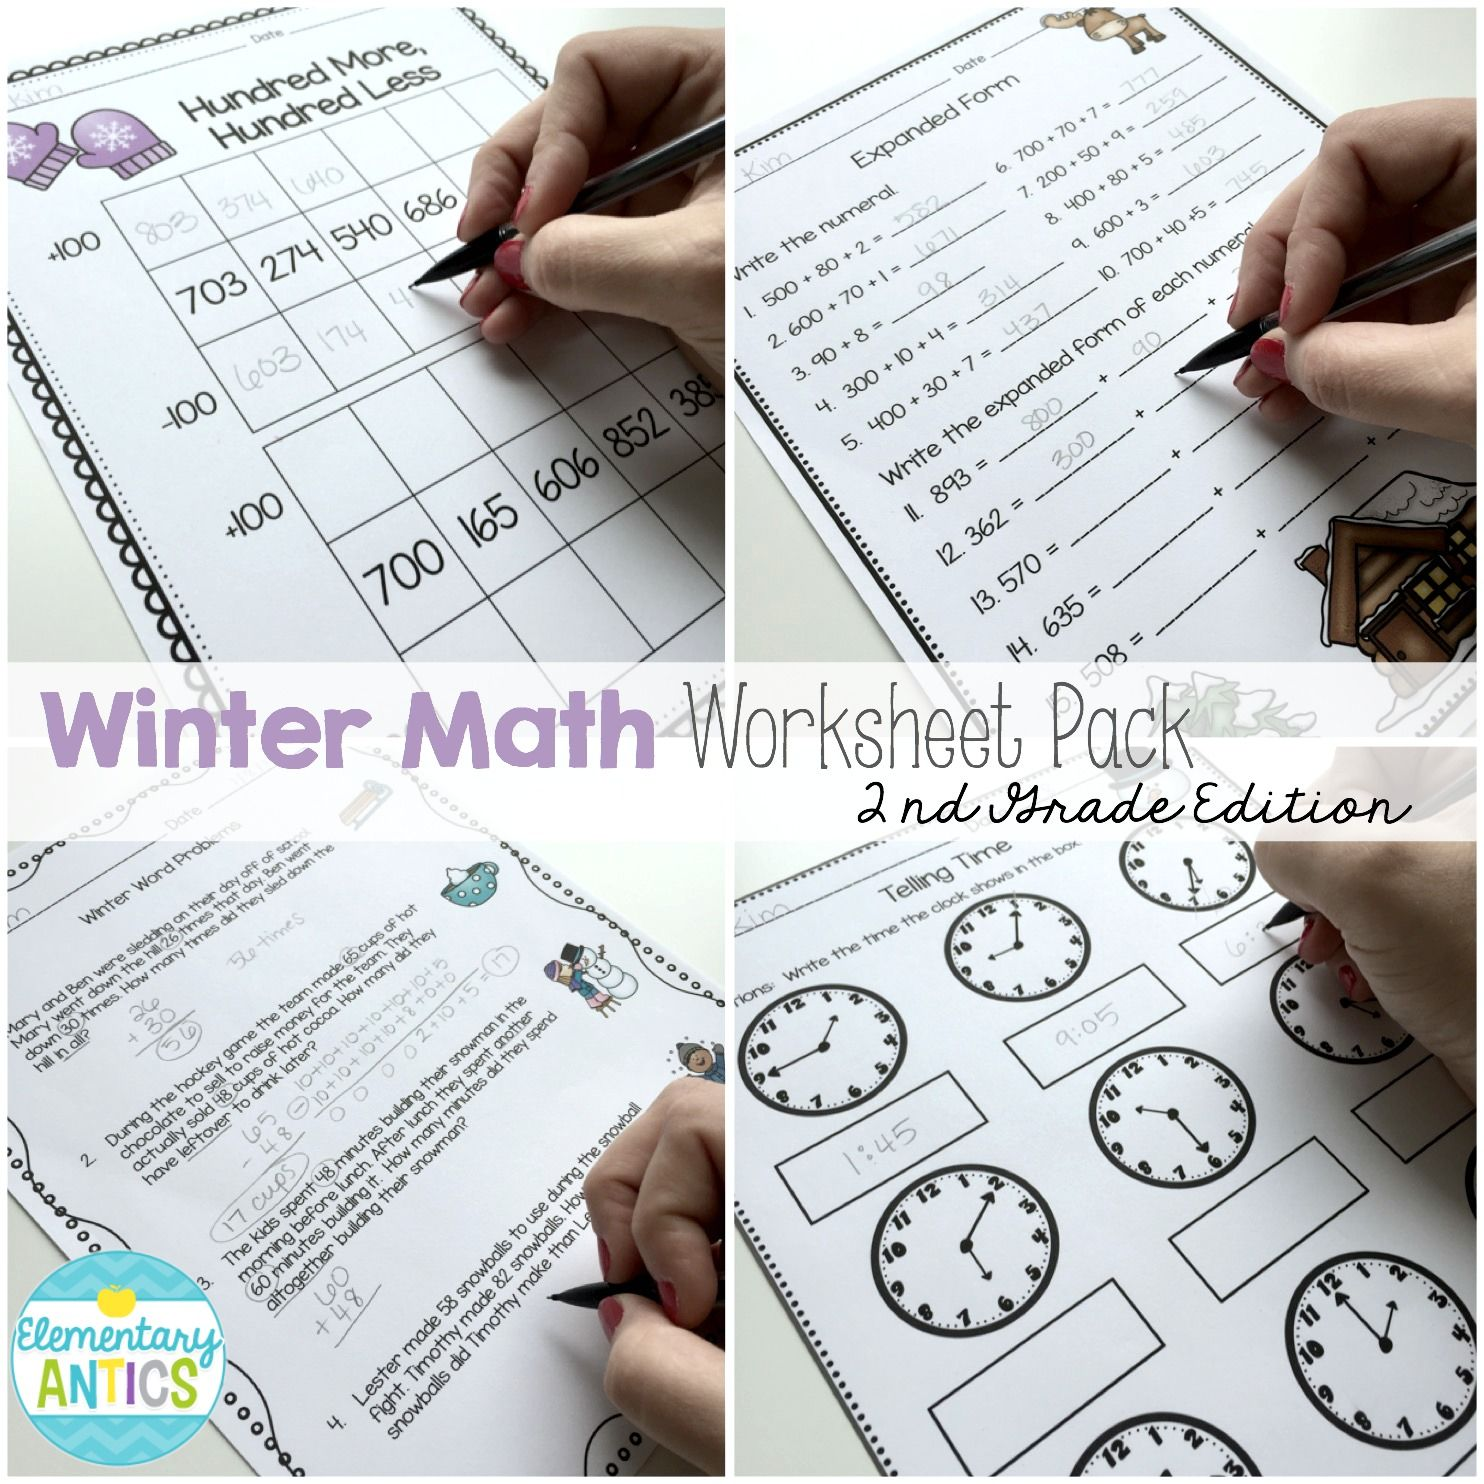 Winter Math Worksheet Pack 2nd Grade Math Worksheets Telling